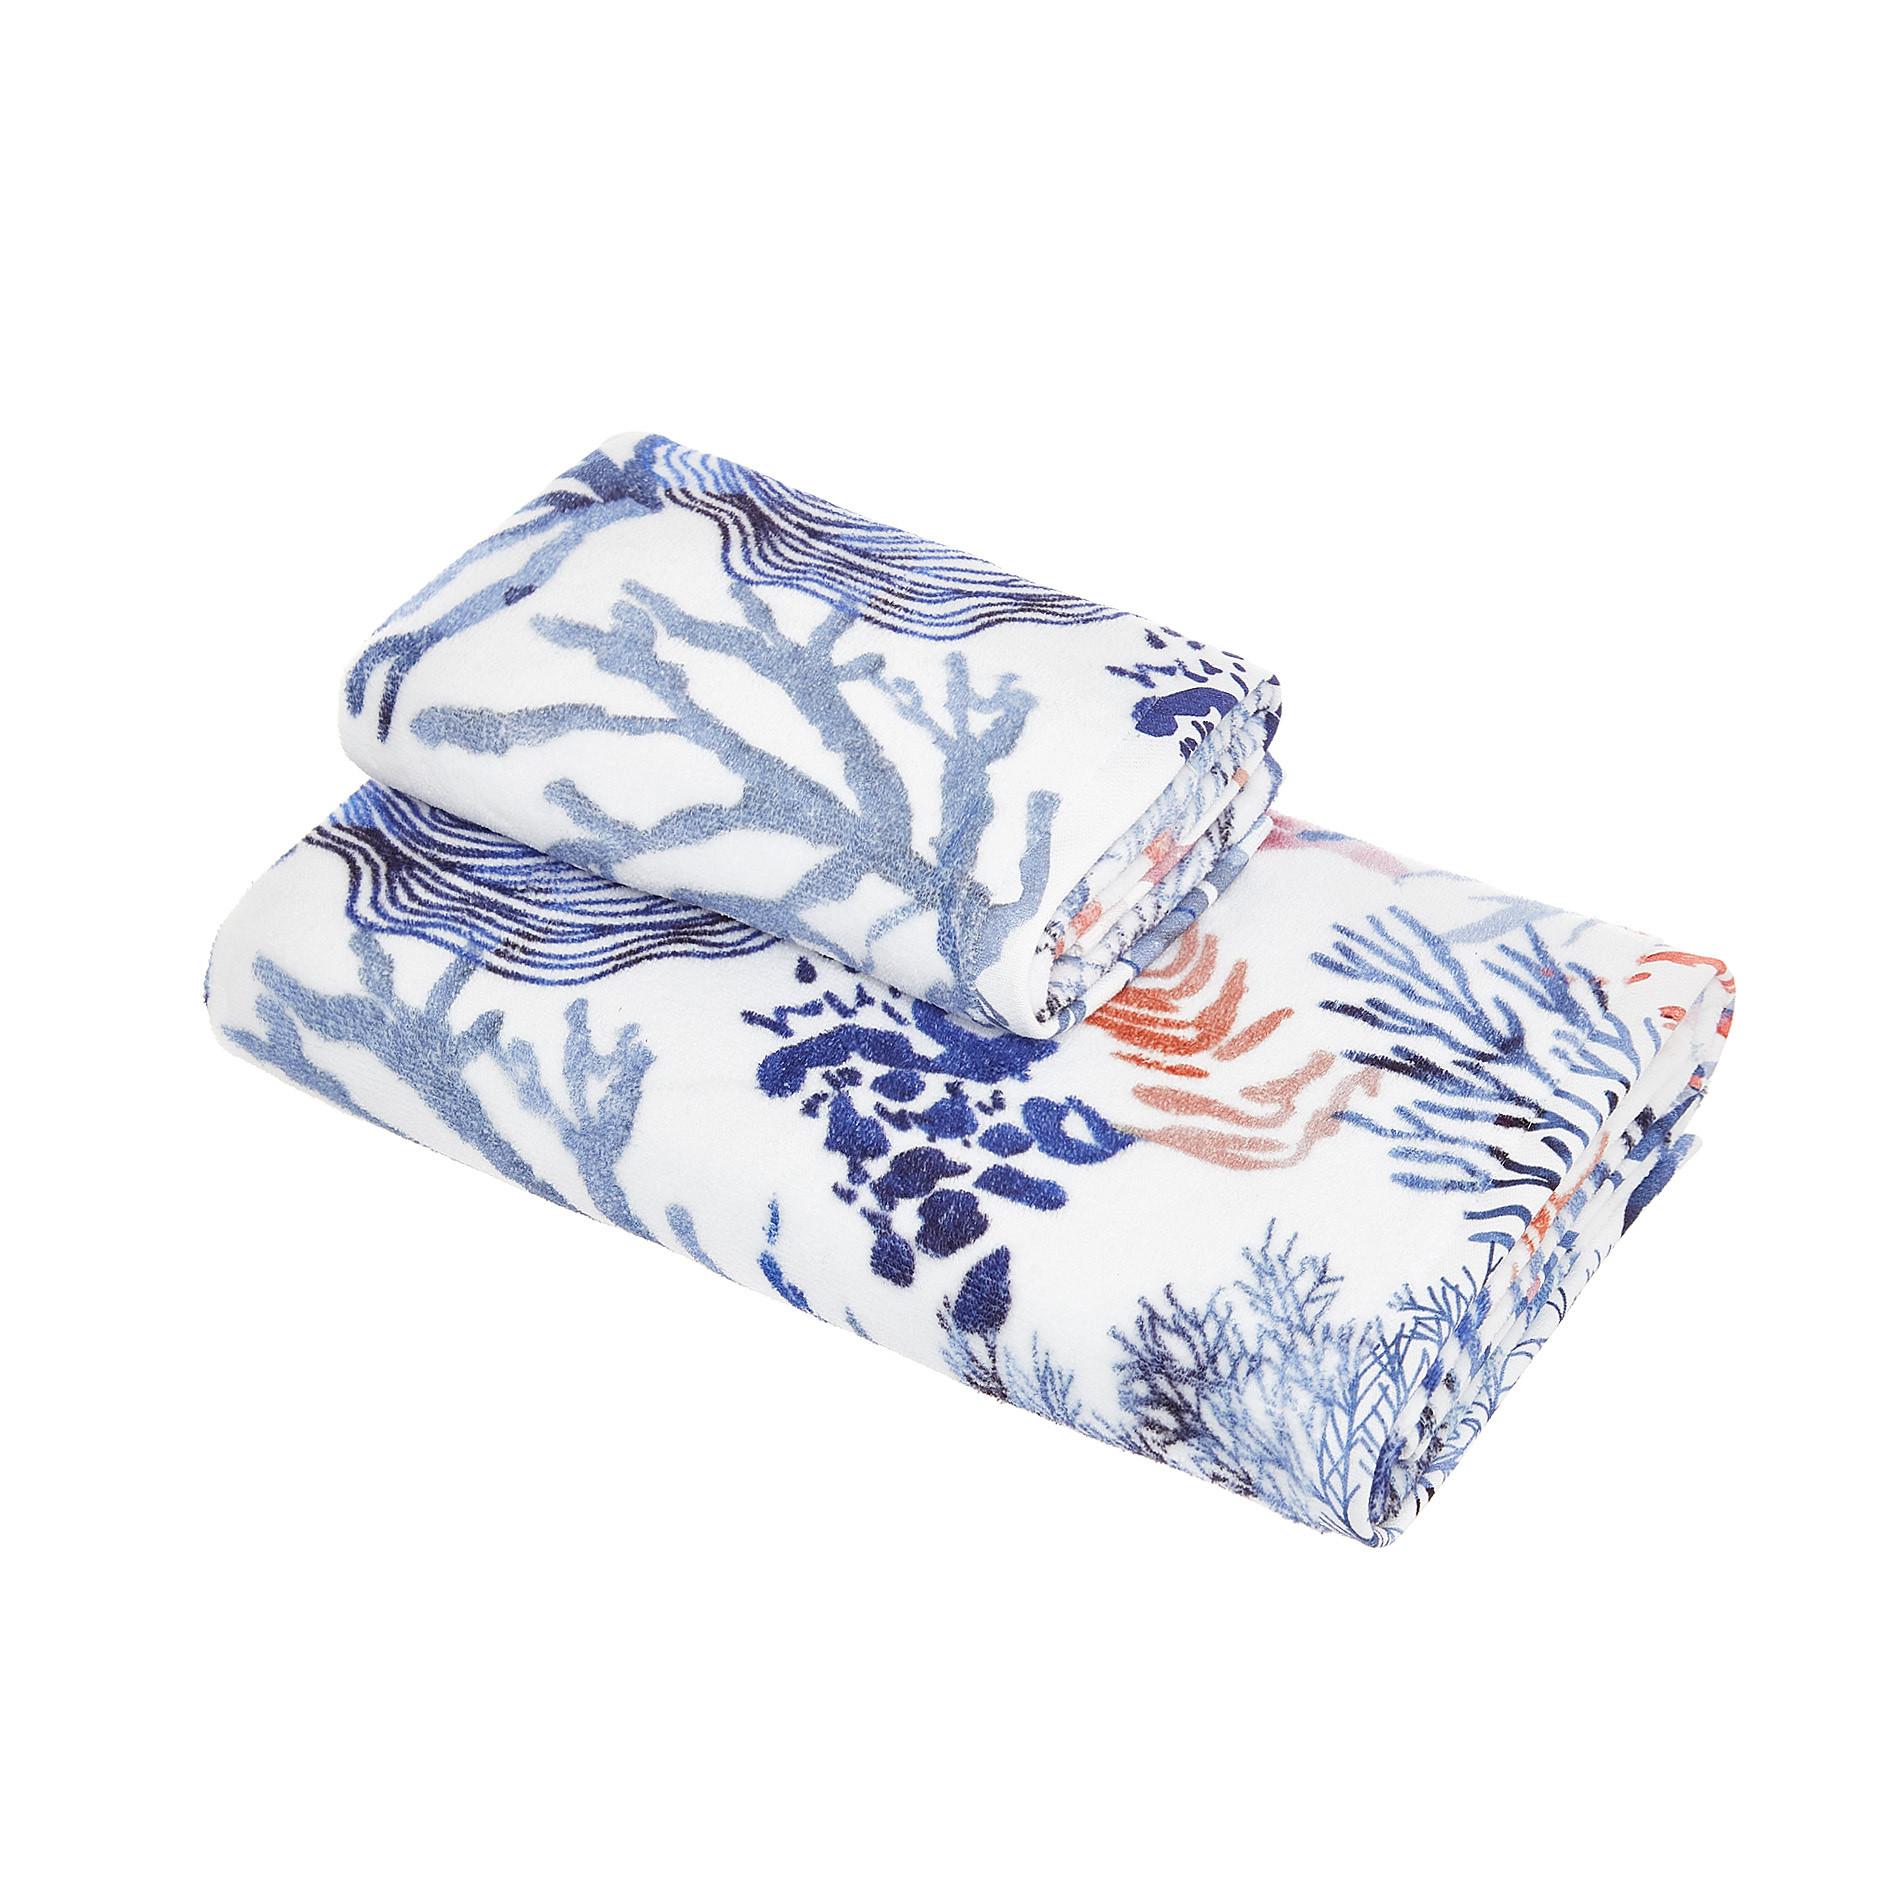 Asciugamano cotone velour stampa coralli, Bianco, large image number 0